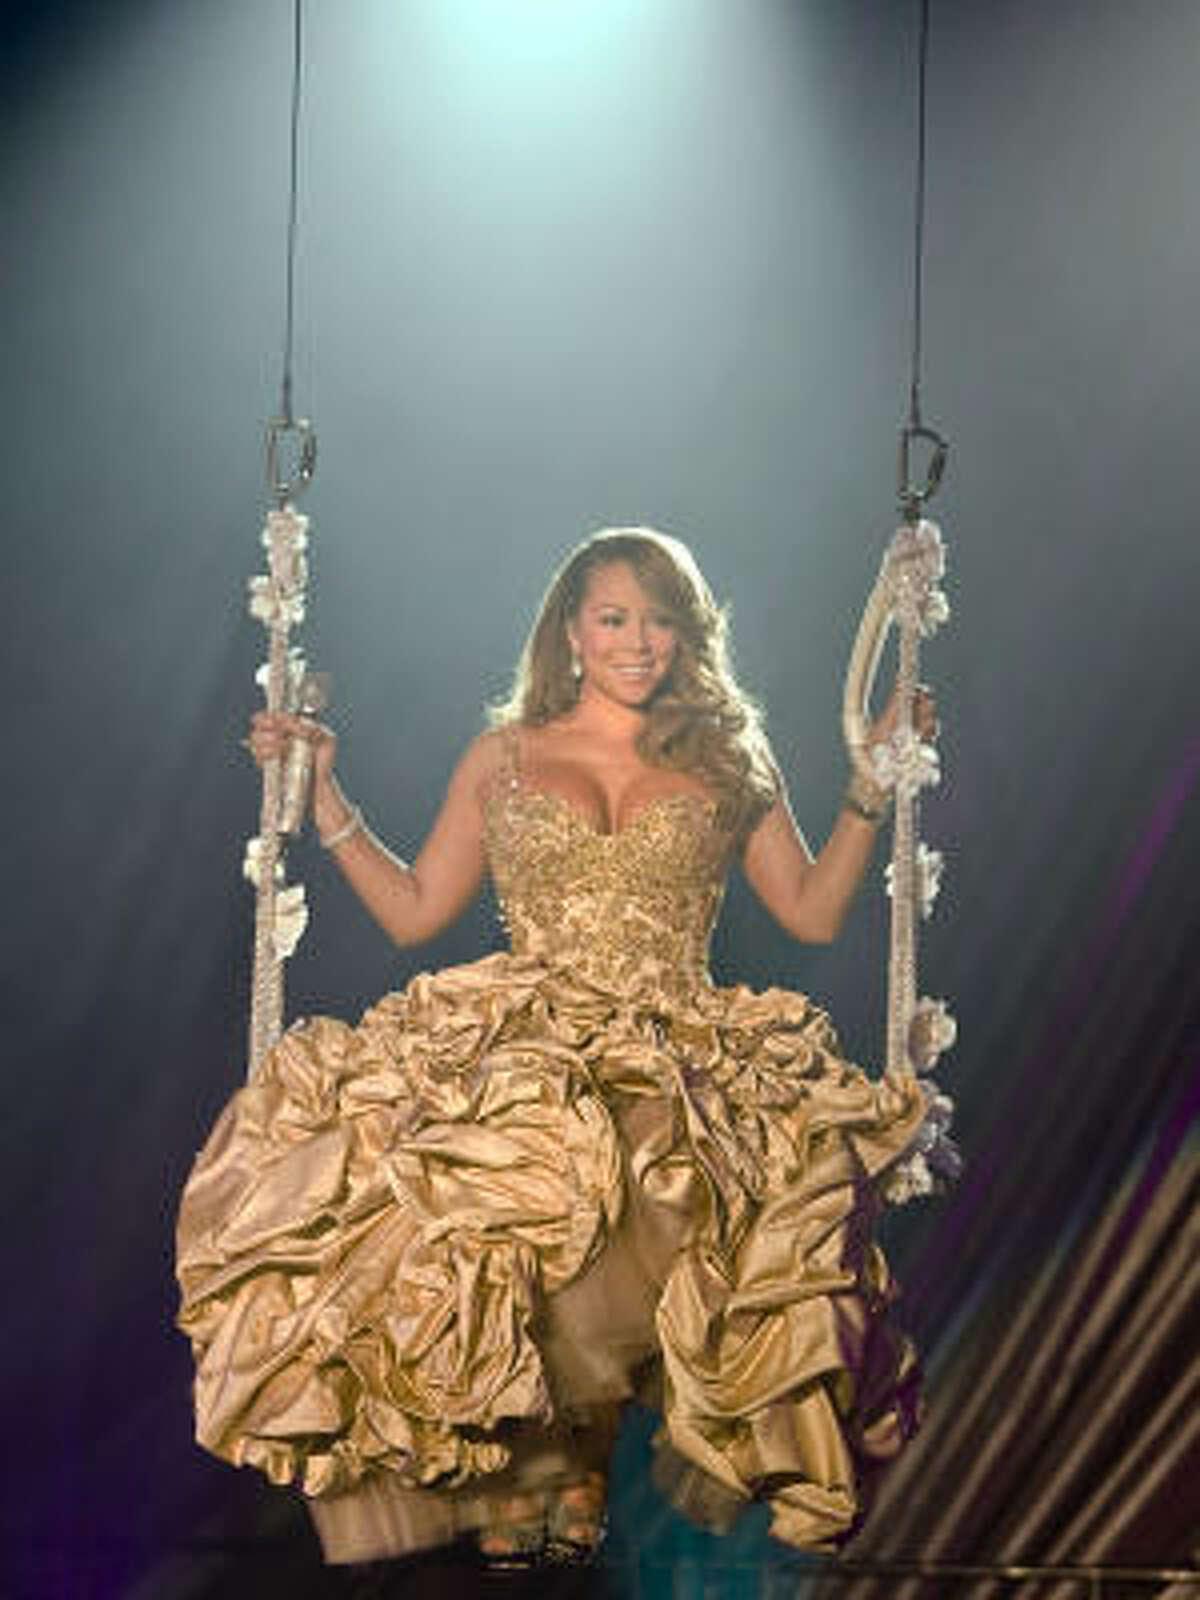 Mariah Carey flies high during Wednesday's concert.